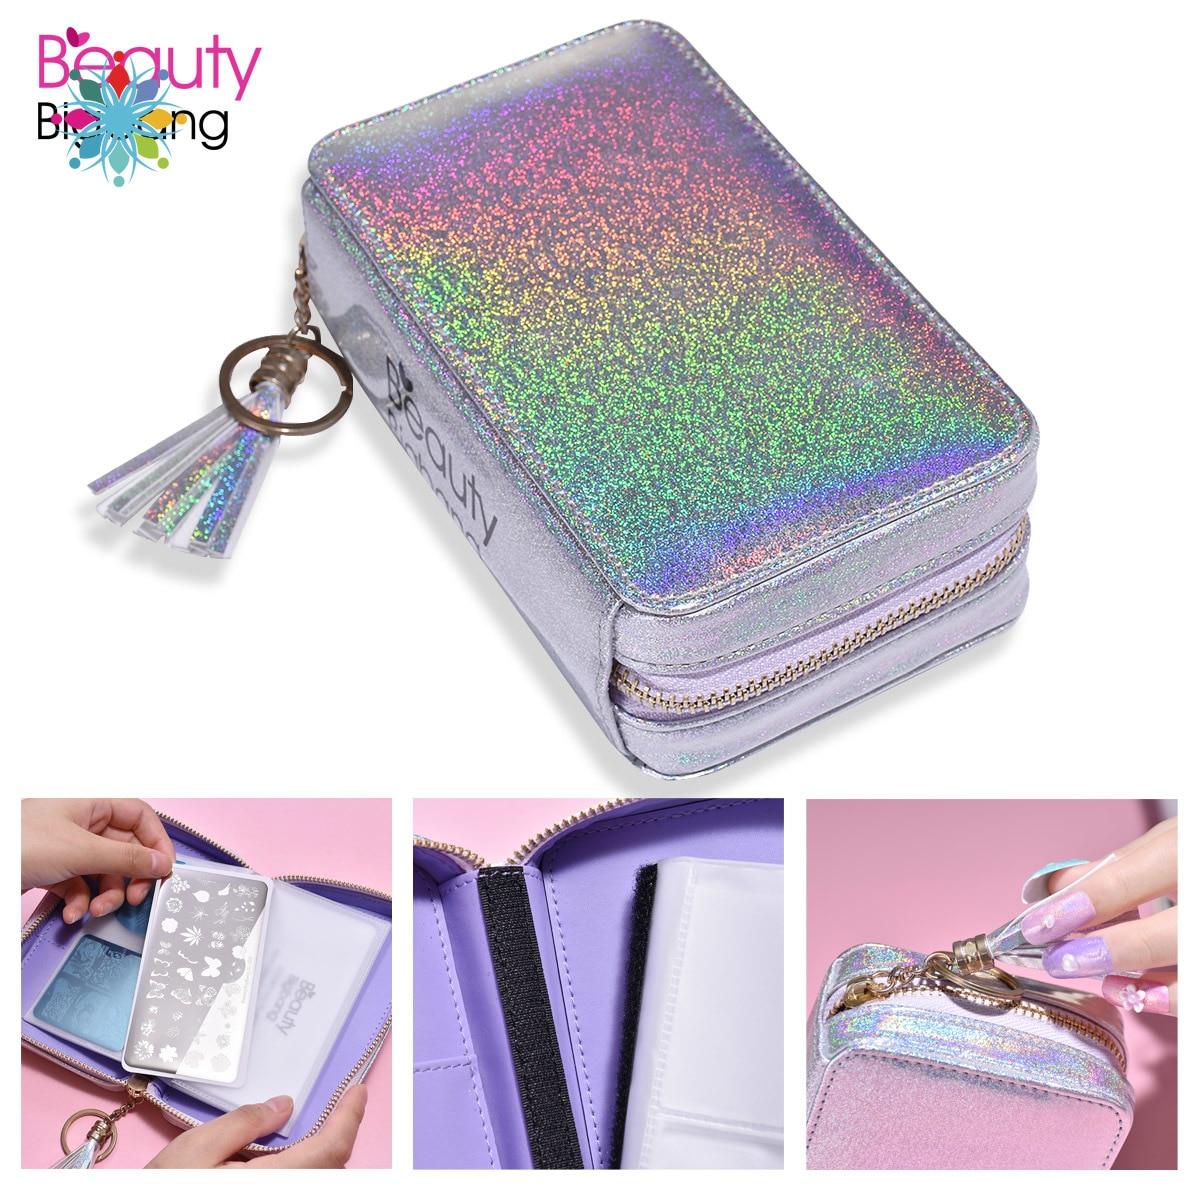 Multifunctionele Nail Art Stempelen Plaat Houder Tas Stamper Bag Organizer Nagellak Make-Up Tas